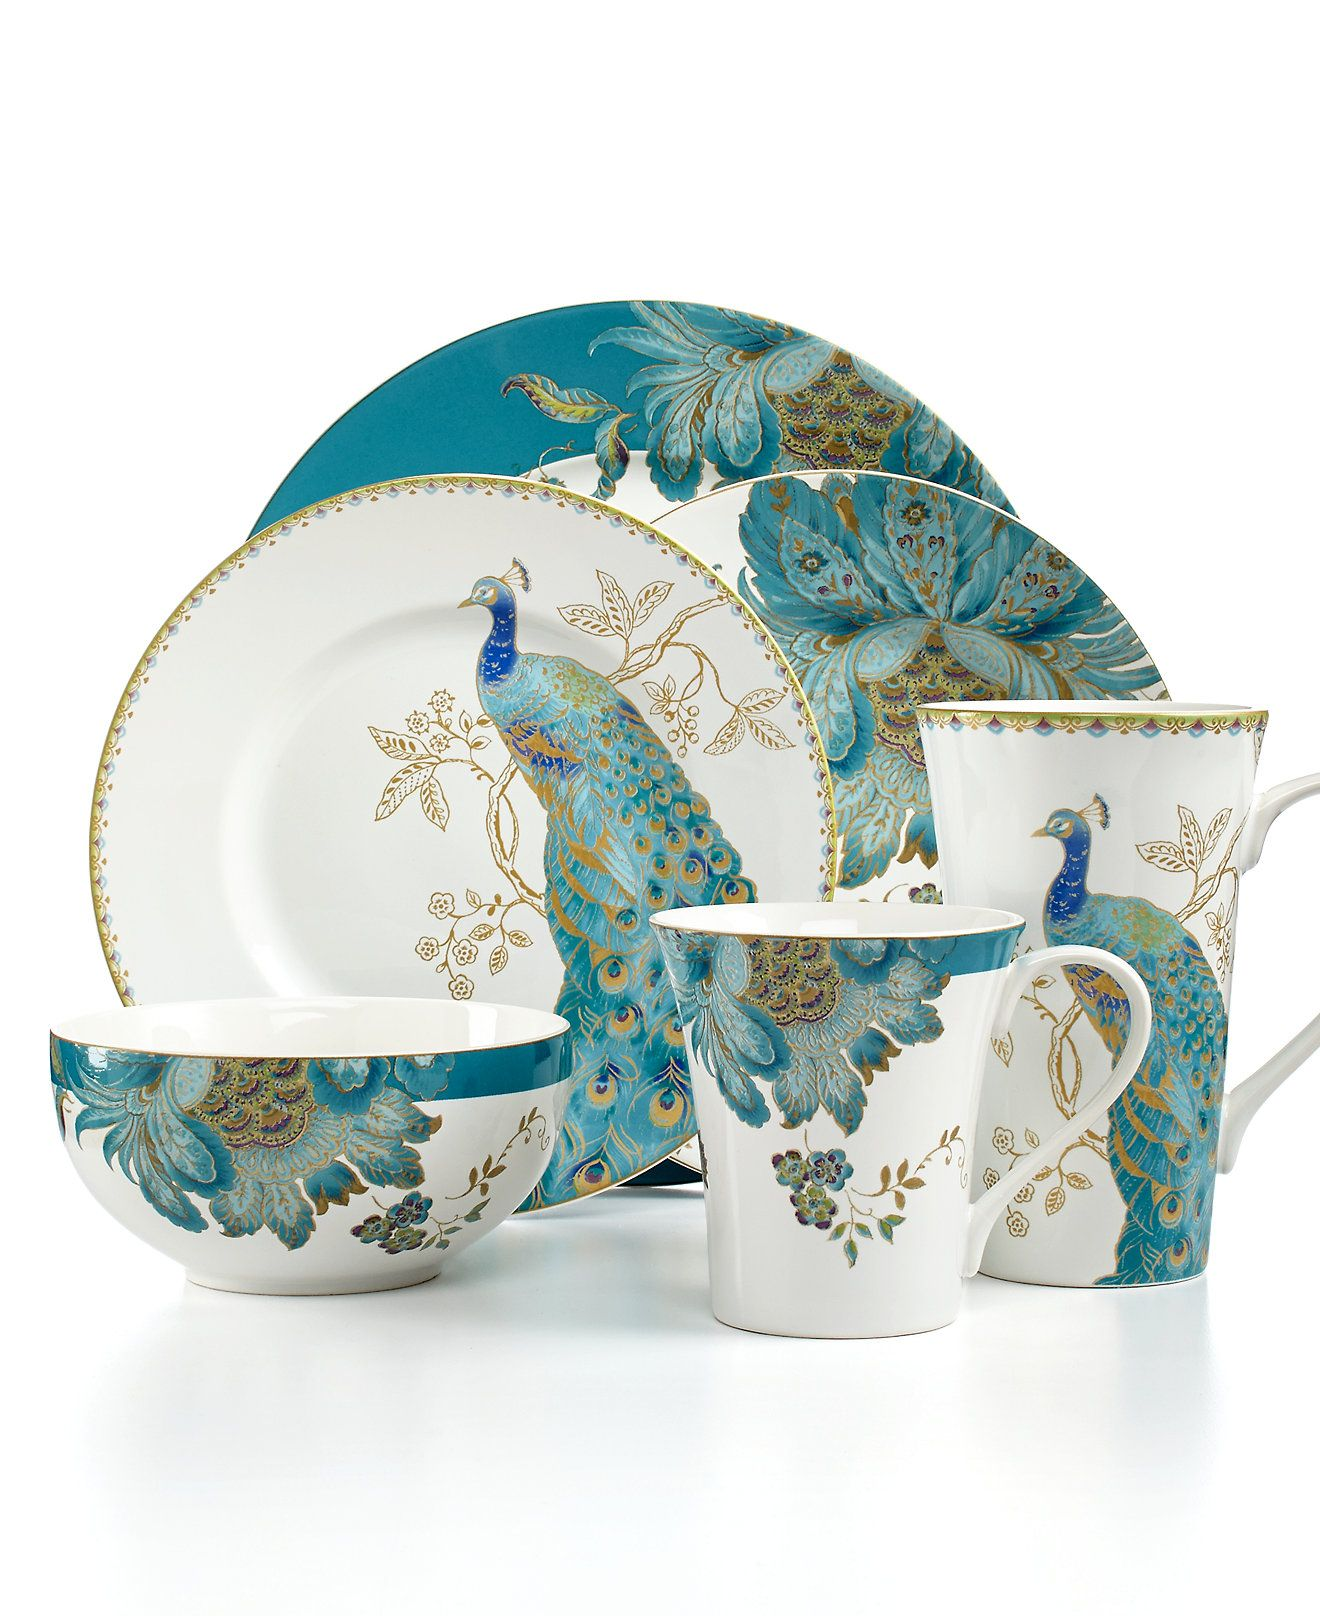 222 Fifth Dinnerware Eliza Teal \u0026 Peacock Garden Mix \u0026 Match Collection - Casual Dinnerware -  sc 1 st  Pinterest & 222 Fifth Dinnerware Eliza Teal \u0026 Peacock Garden Mix \u0026 Match ...